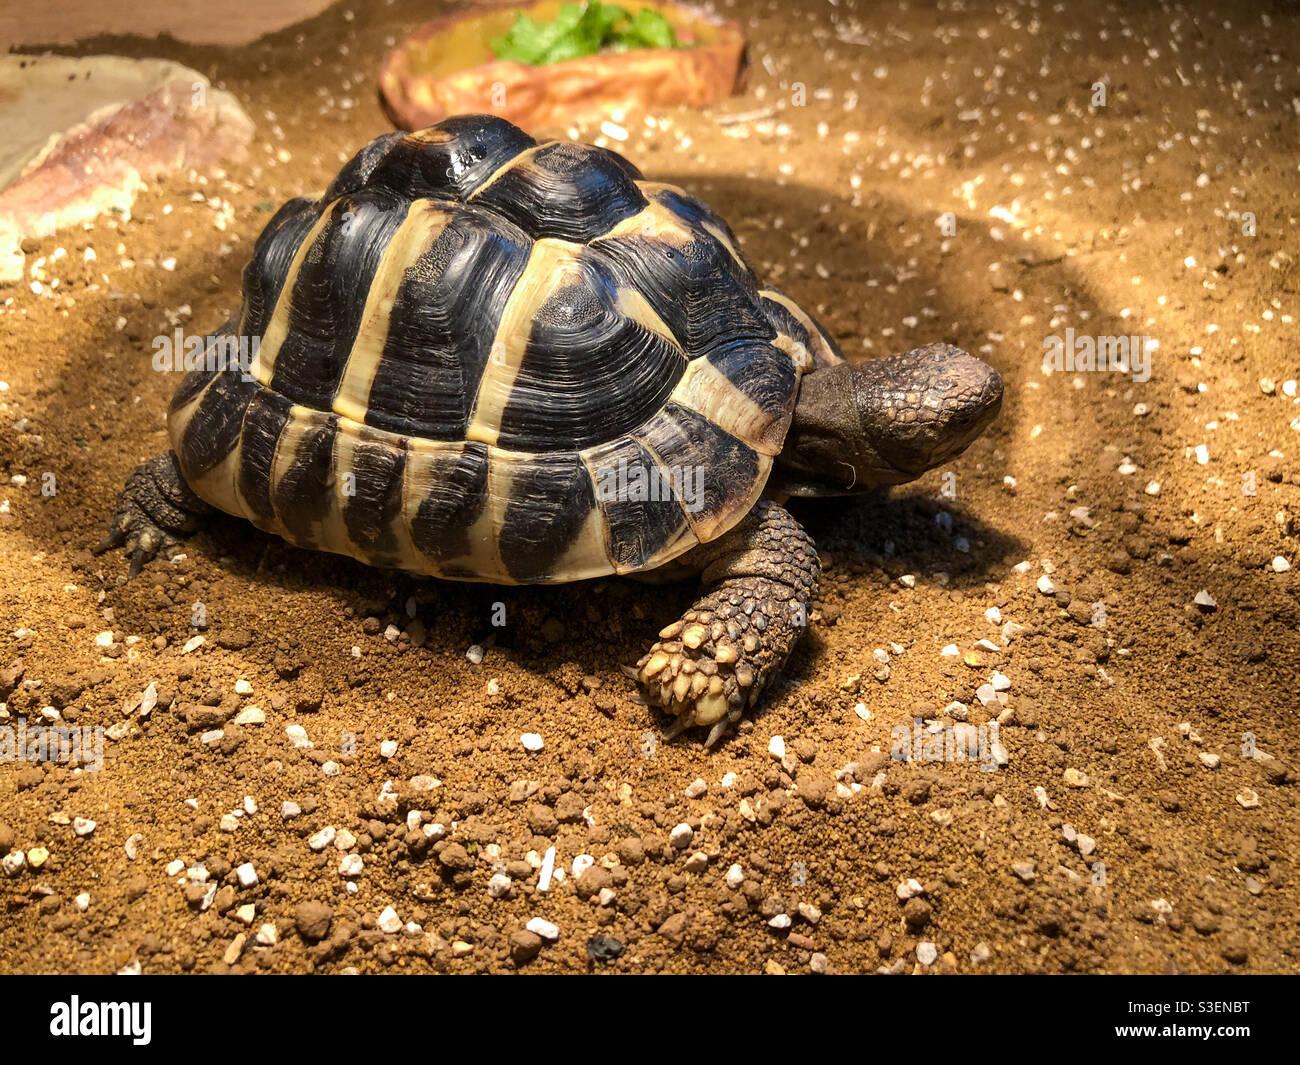 La tortuga Pet hermann disfruta de la luz de una lámpara de basking. Foto de stock